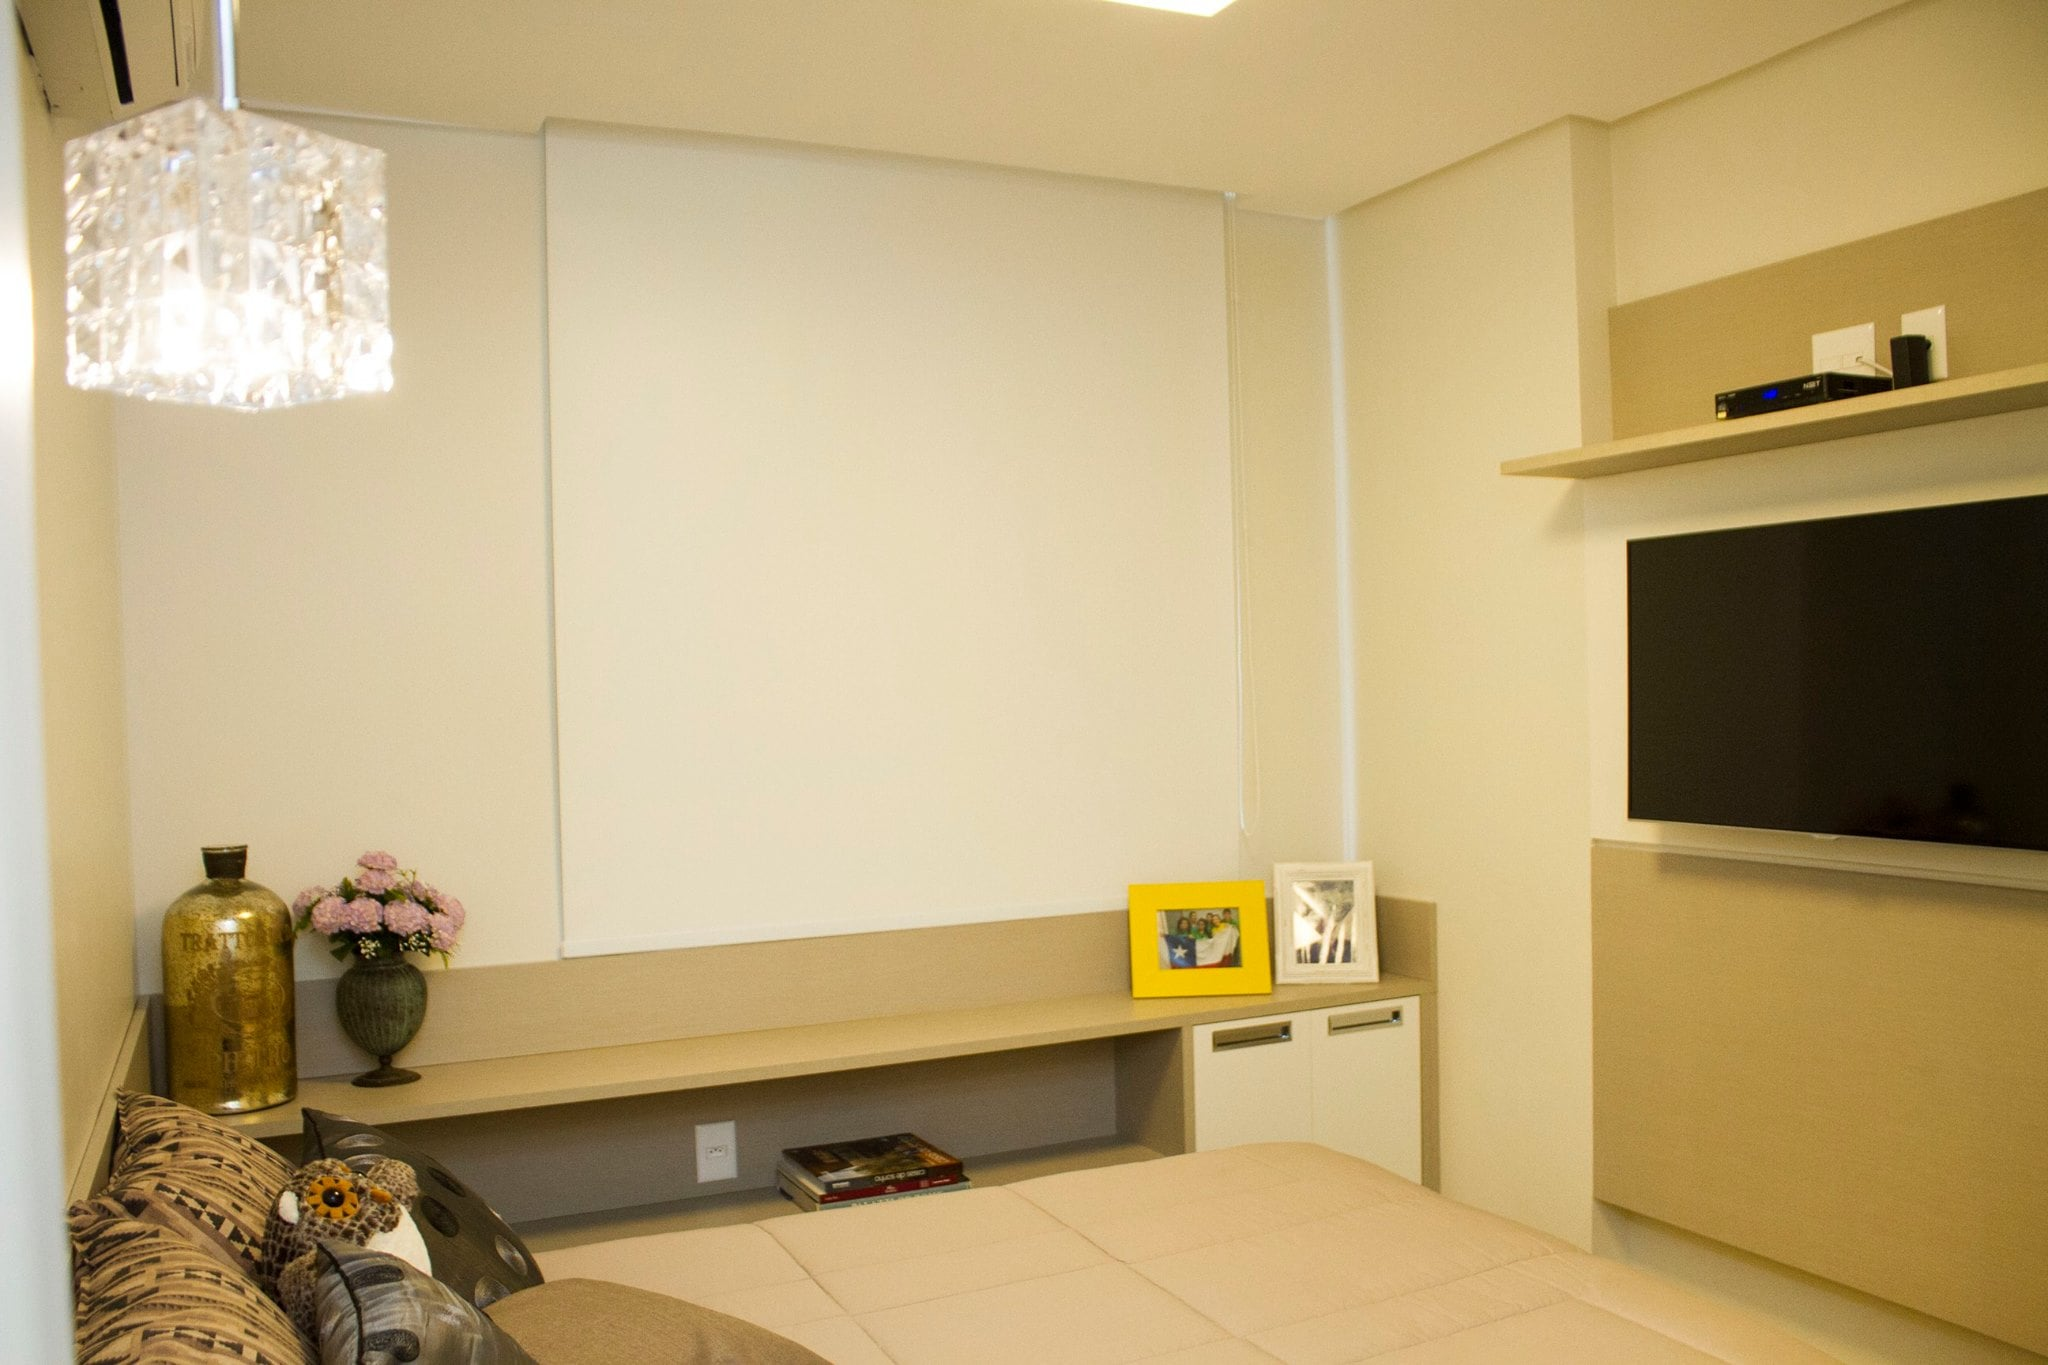 10-Apartamento no Recreio dos Bandeirantes - Arquiteta Carla Del Grande